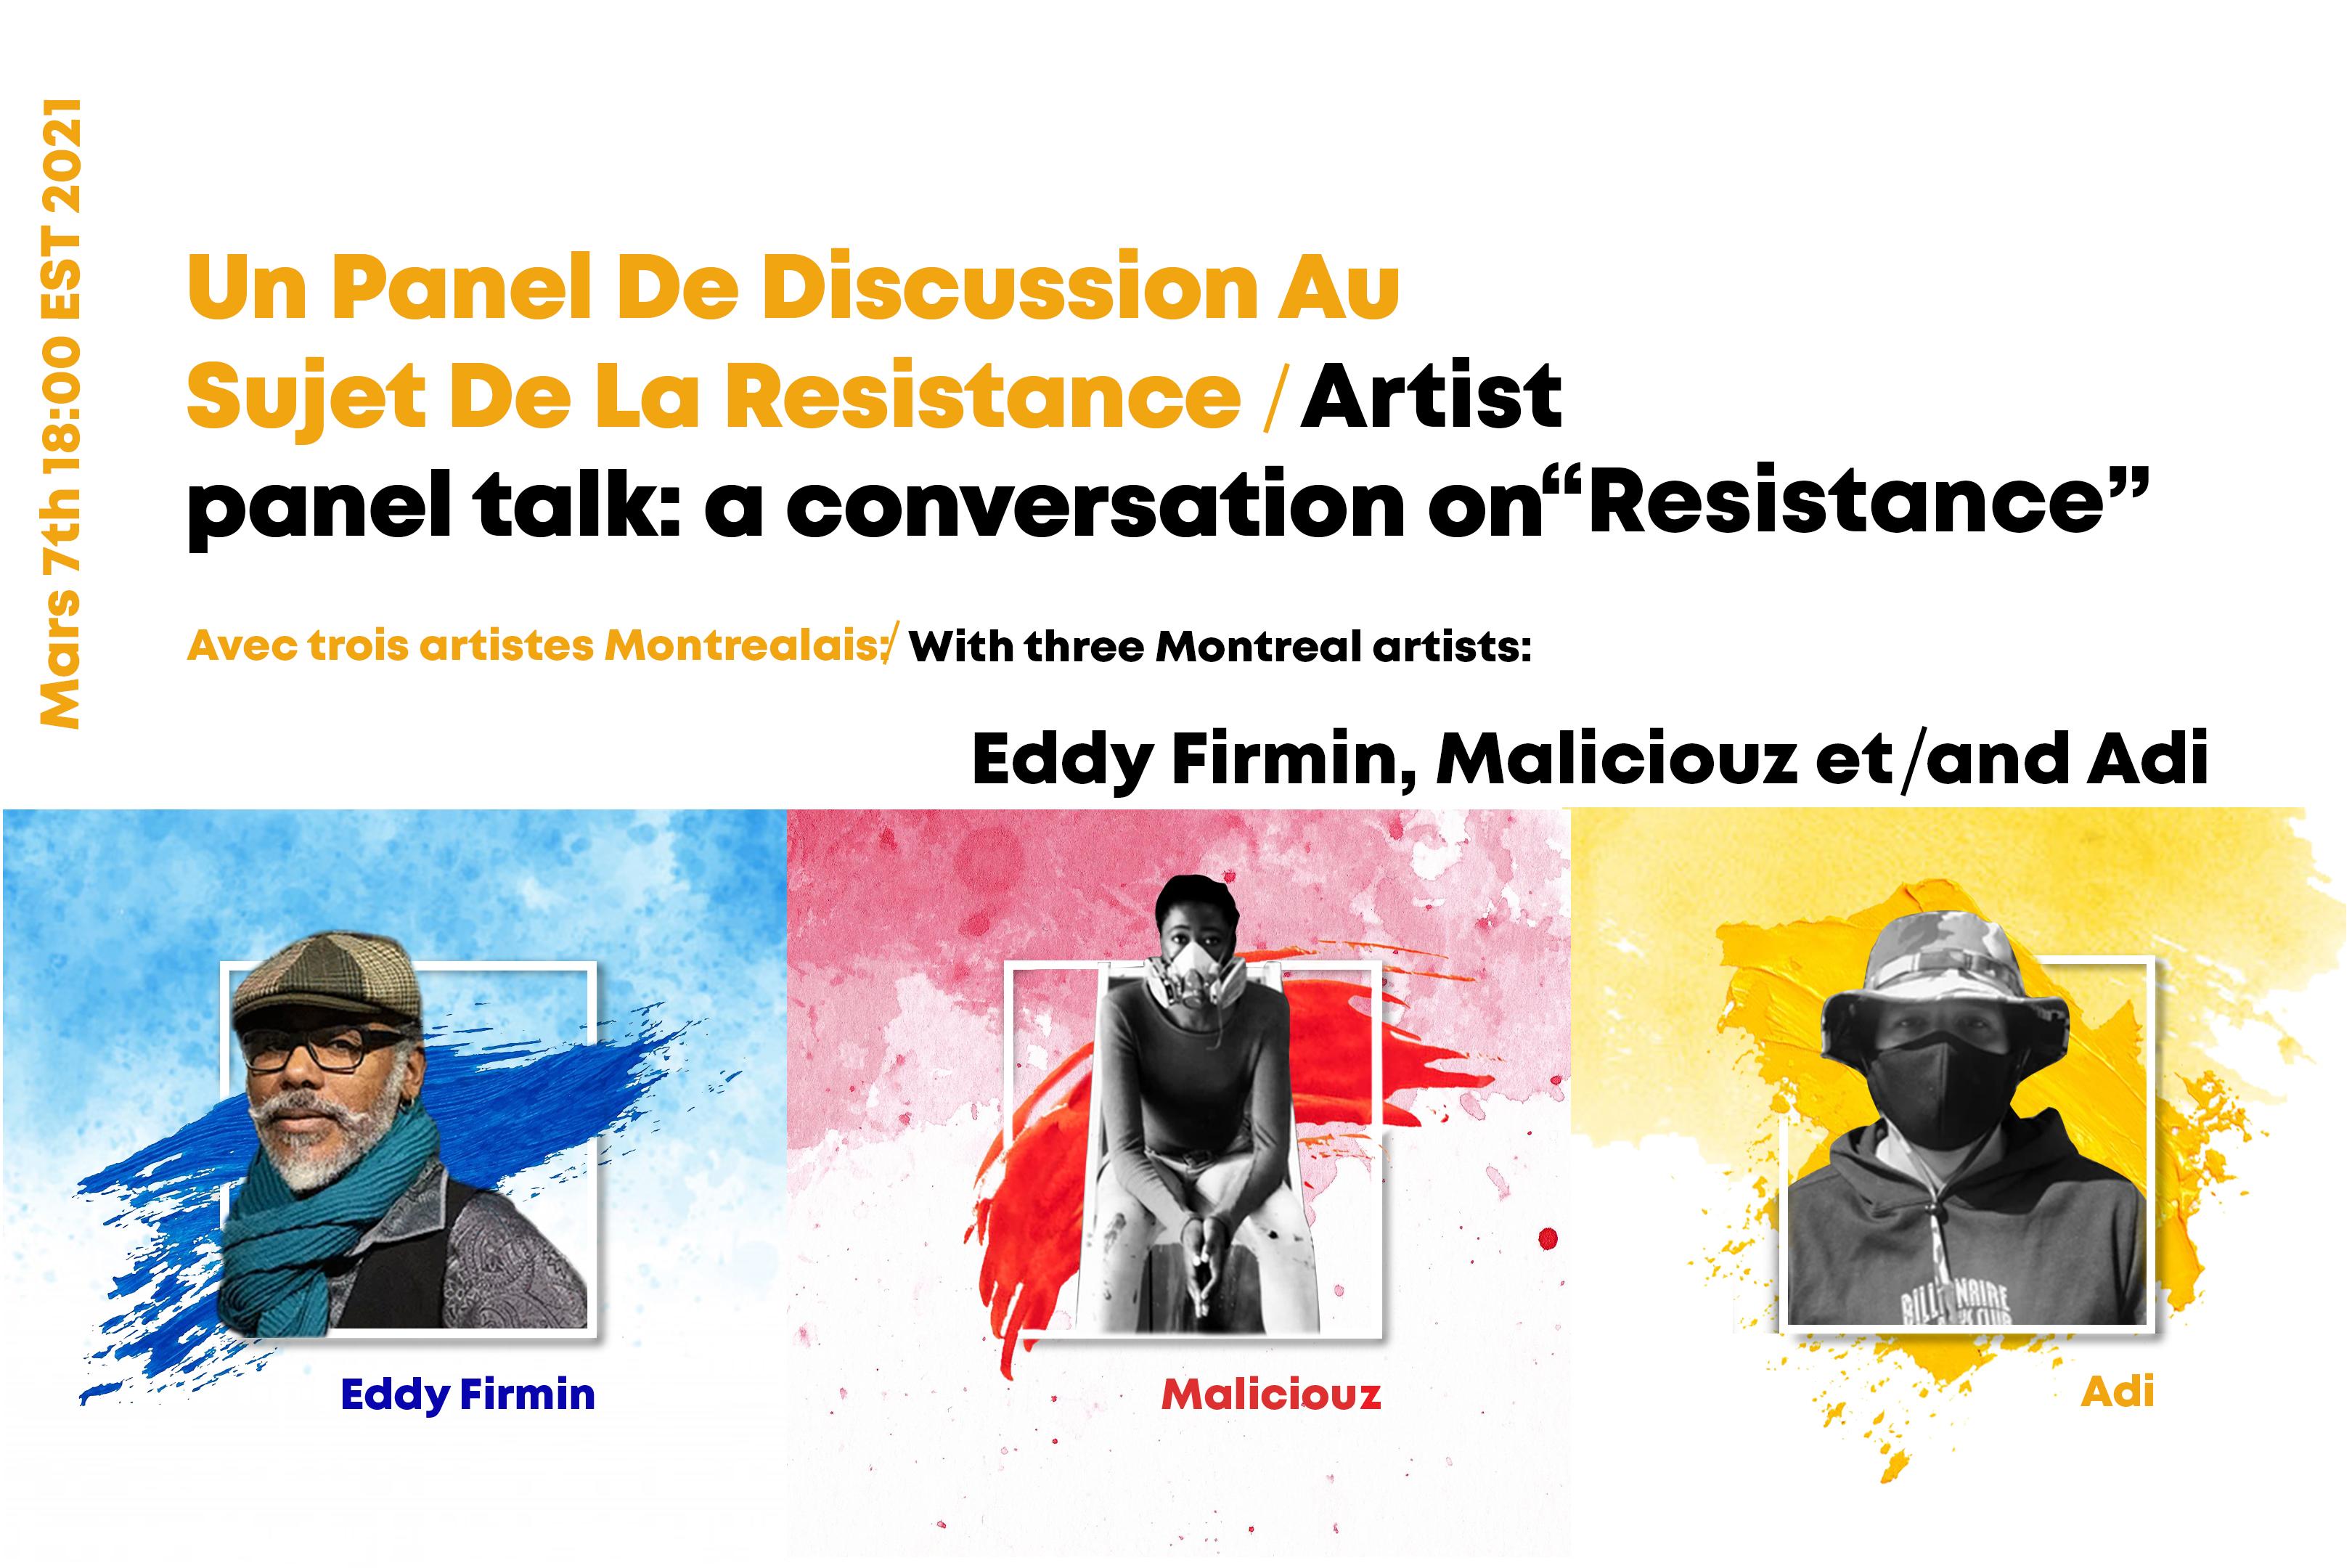 Artists Panel Talk: A Conversation On Resistance